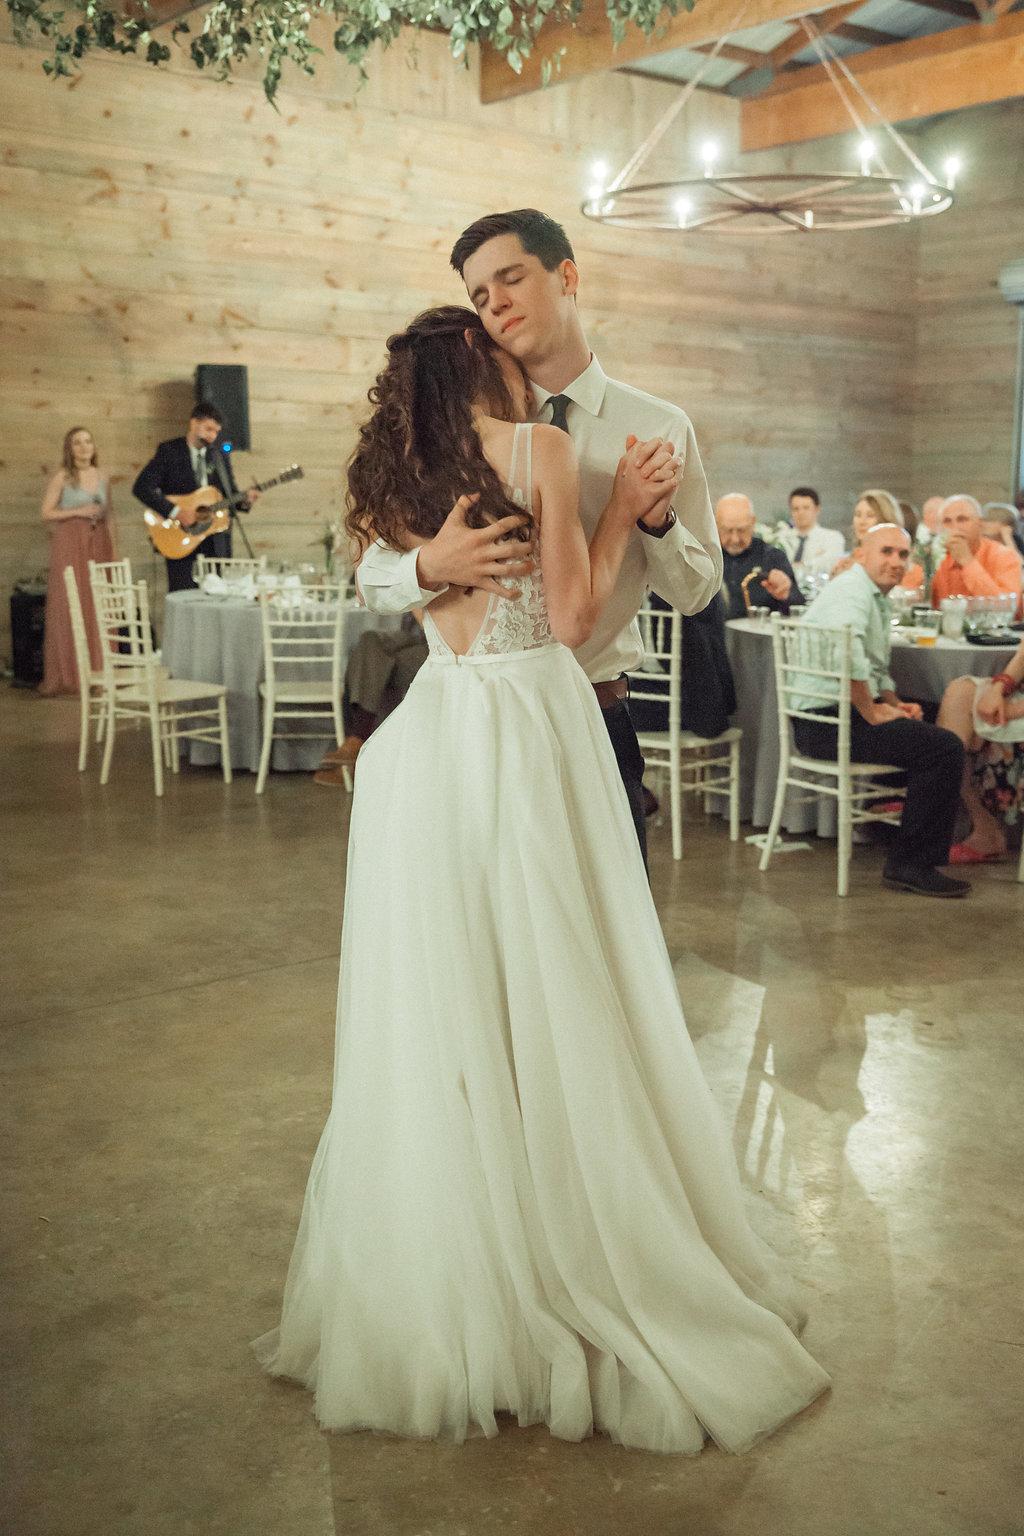 Honeysuckle-Hill-Weddings-Mallory-Patrick-117.jpg